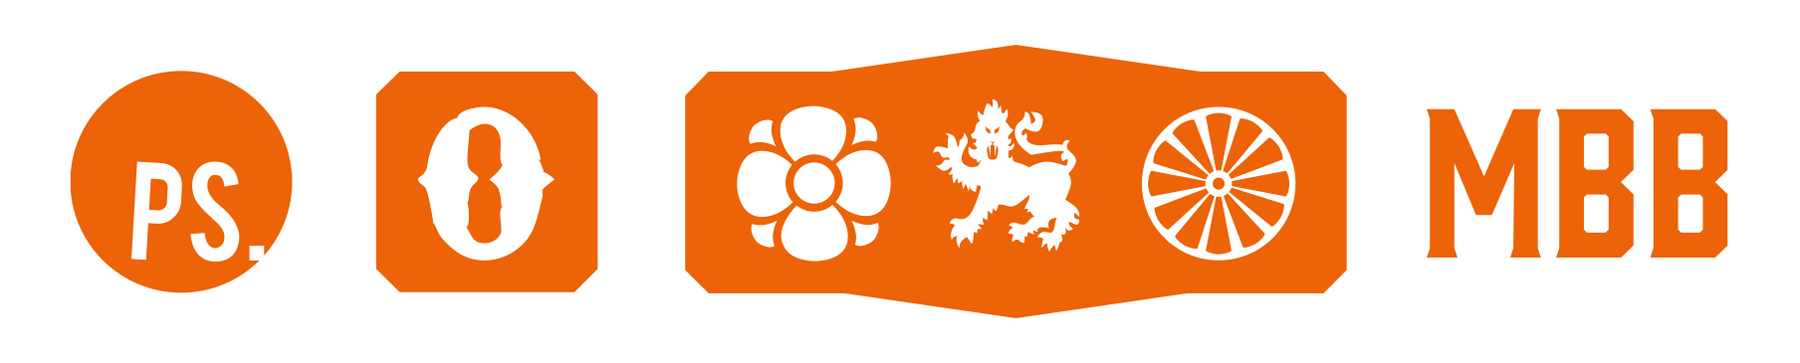 psgen-05-Cambridge_hallmark_40x10_Orange